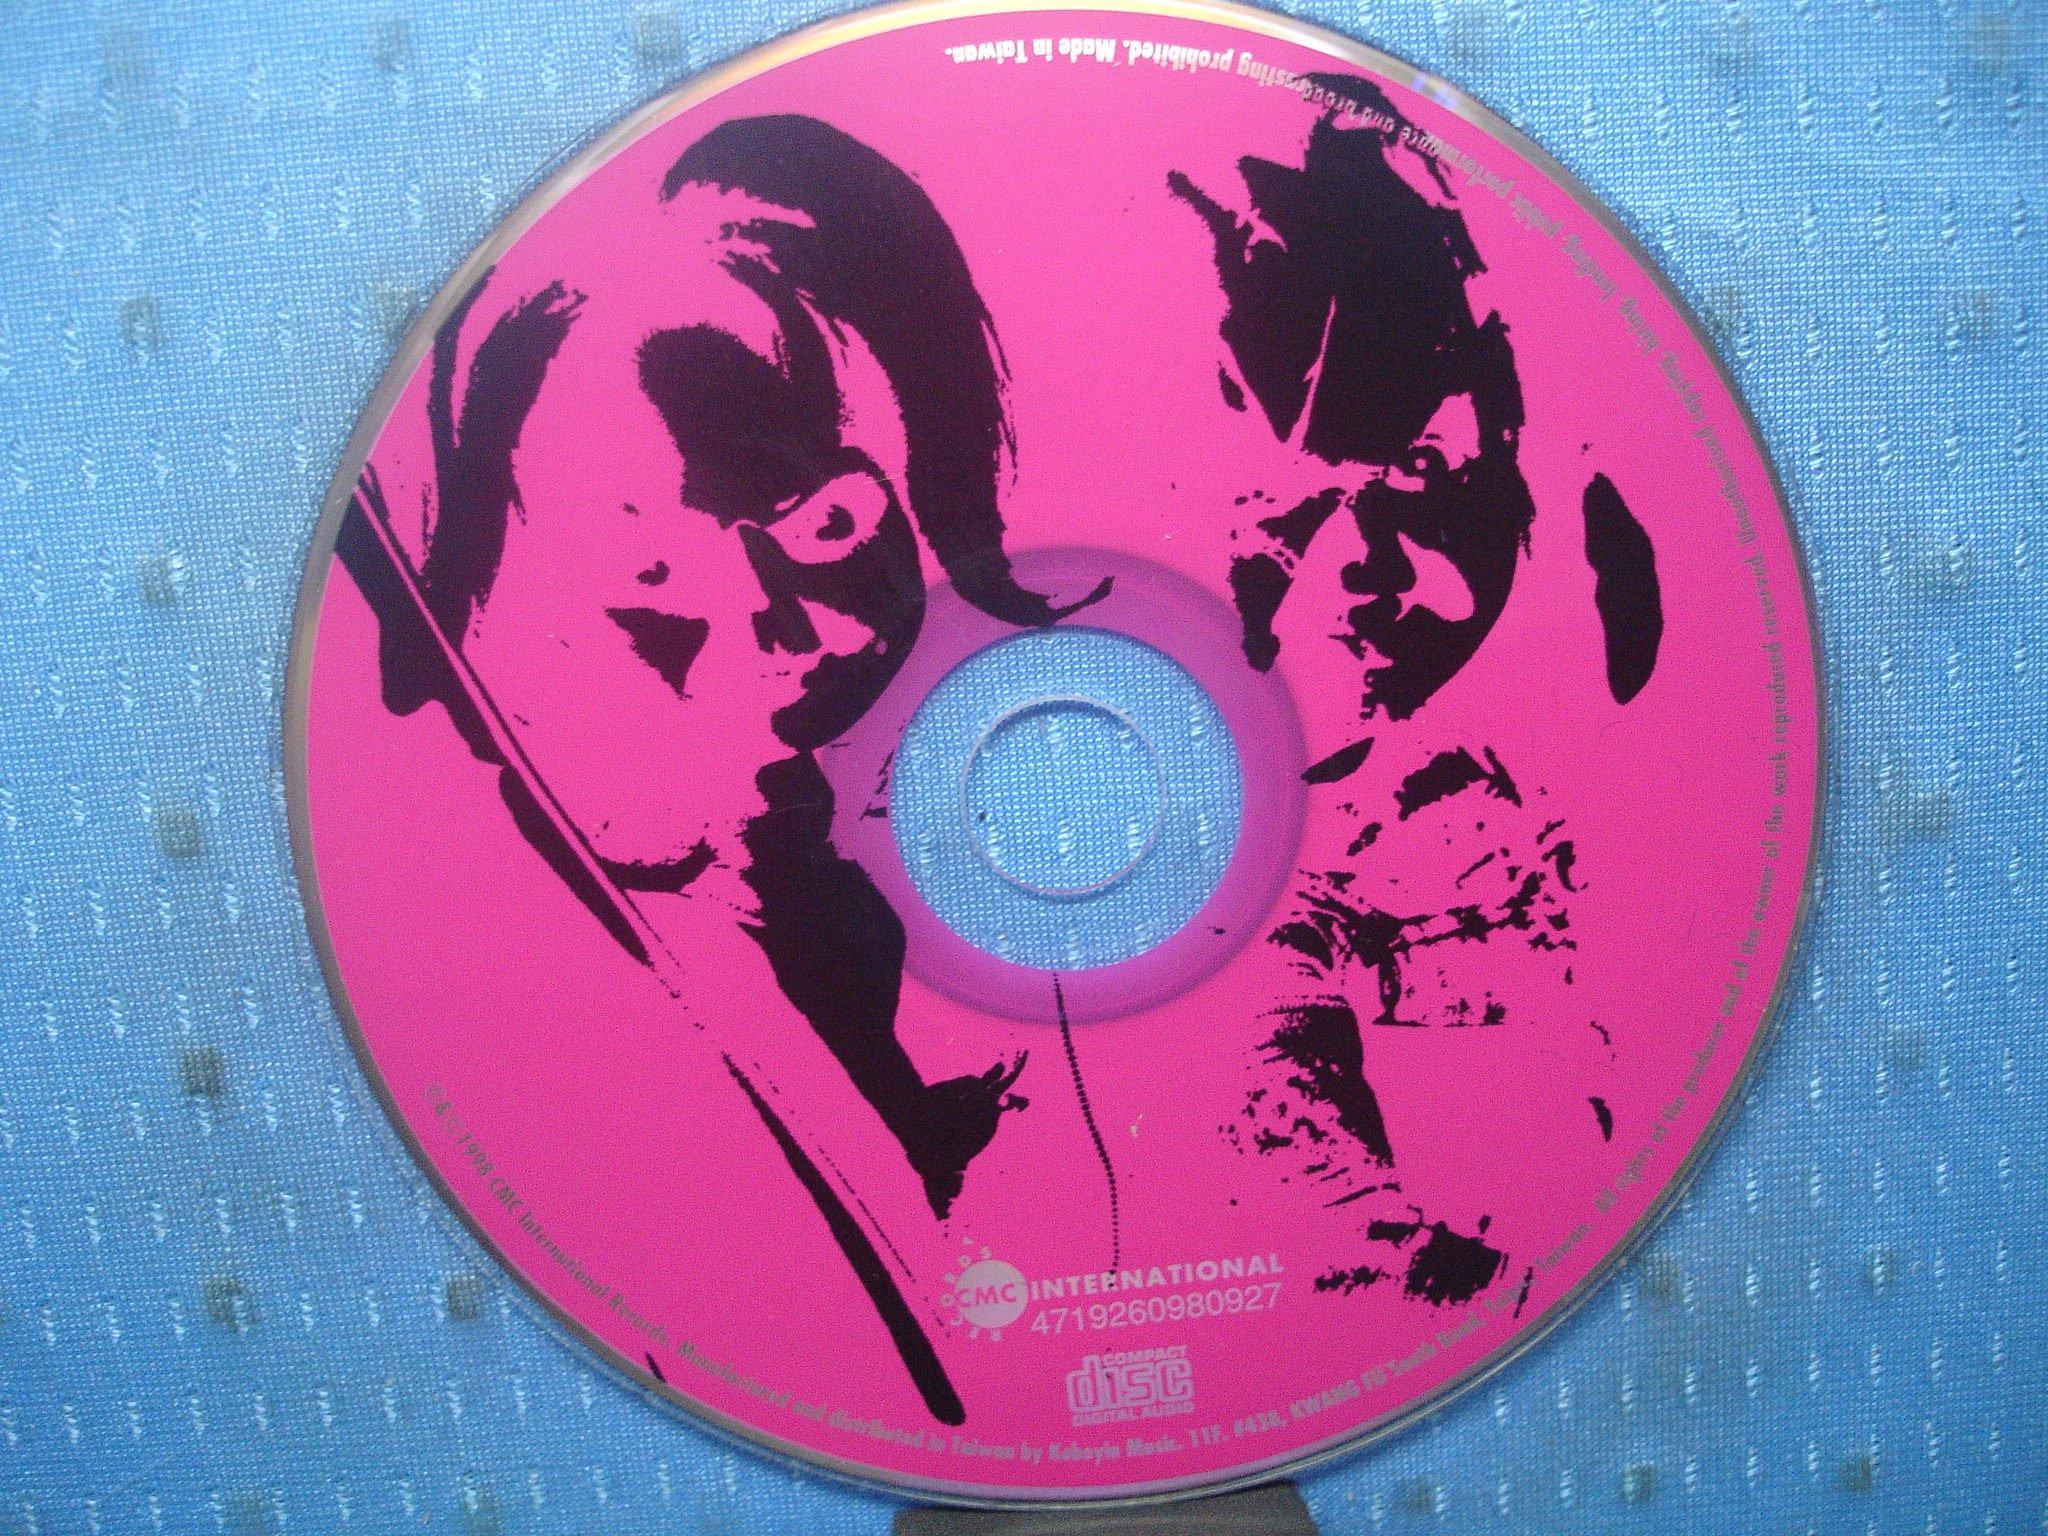 [無殼光碟]GS  Childs Play 4: The Bride of Chucky  鬼娃新娘  電影原聲帶